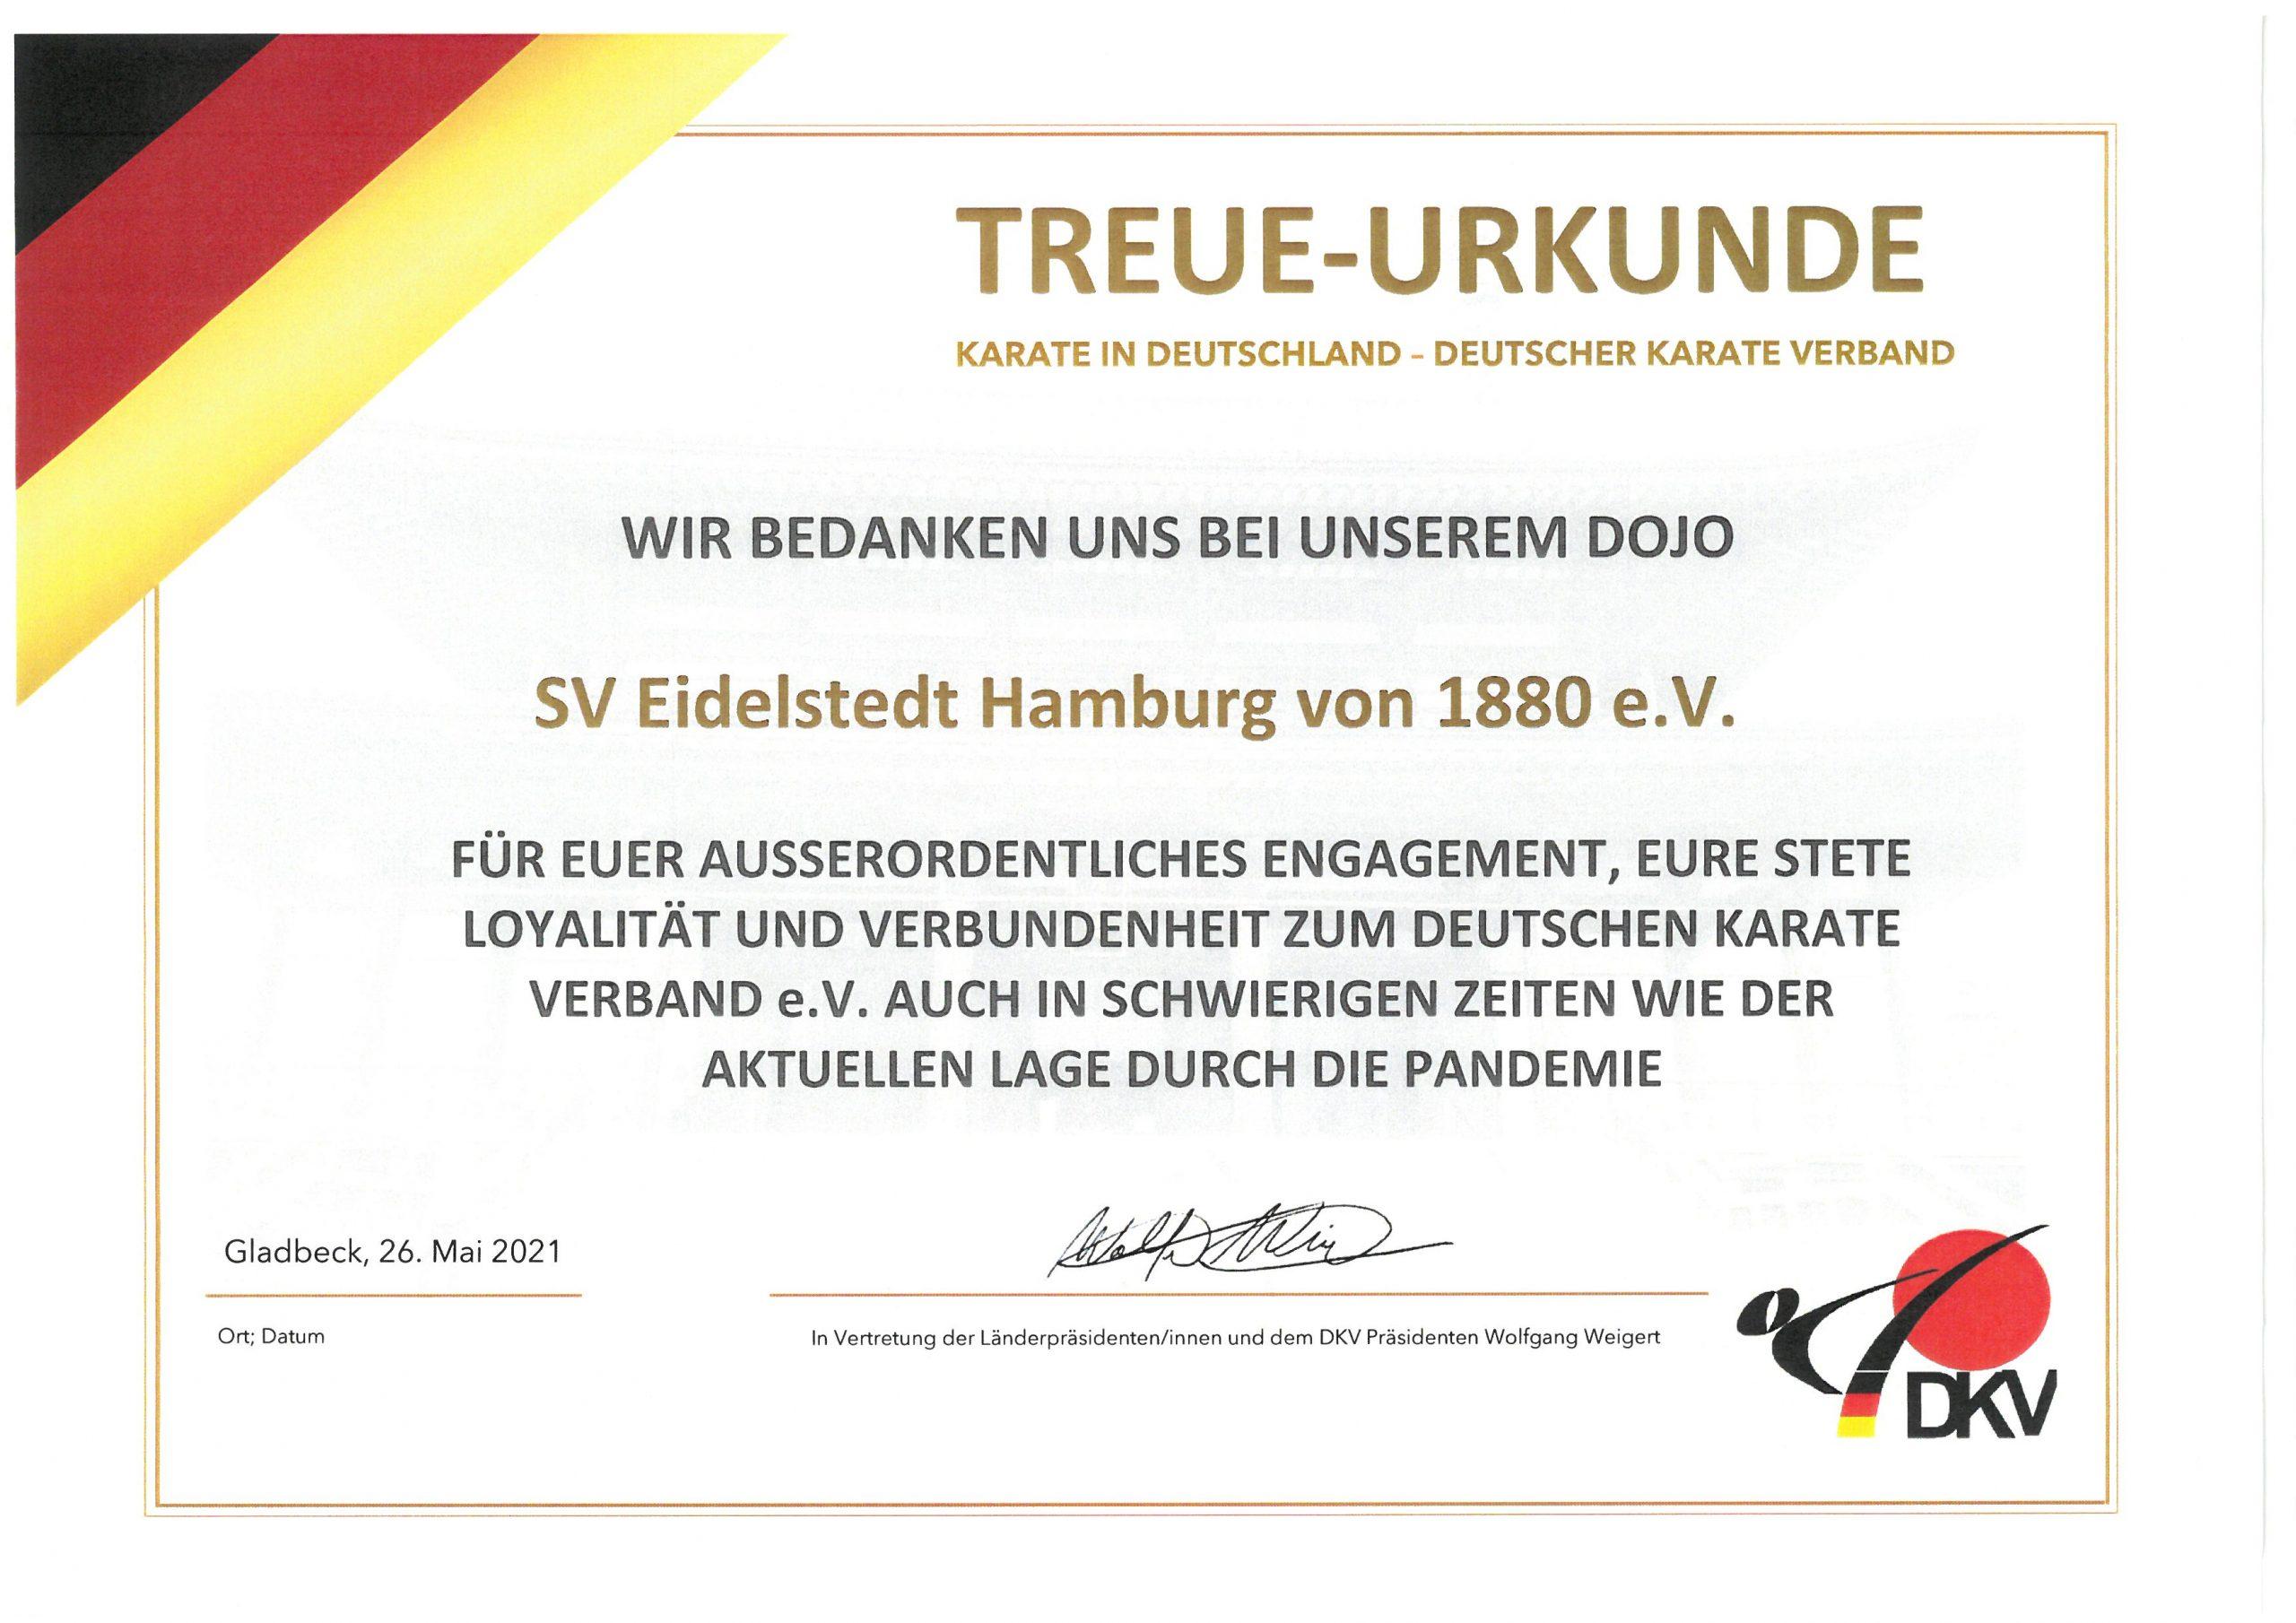 Karate-Abteilung erhält Treue-Urkunde